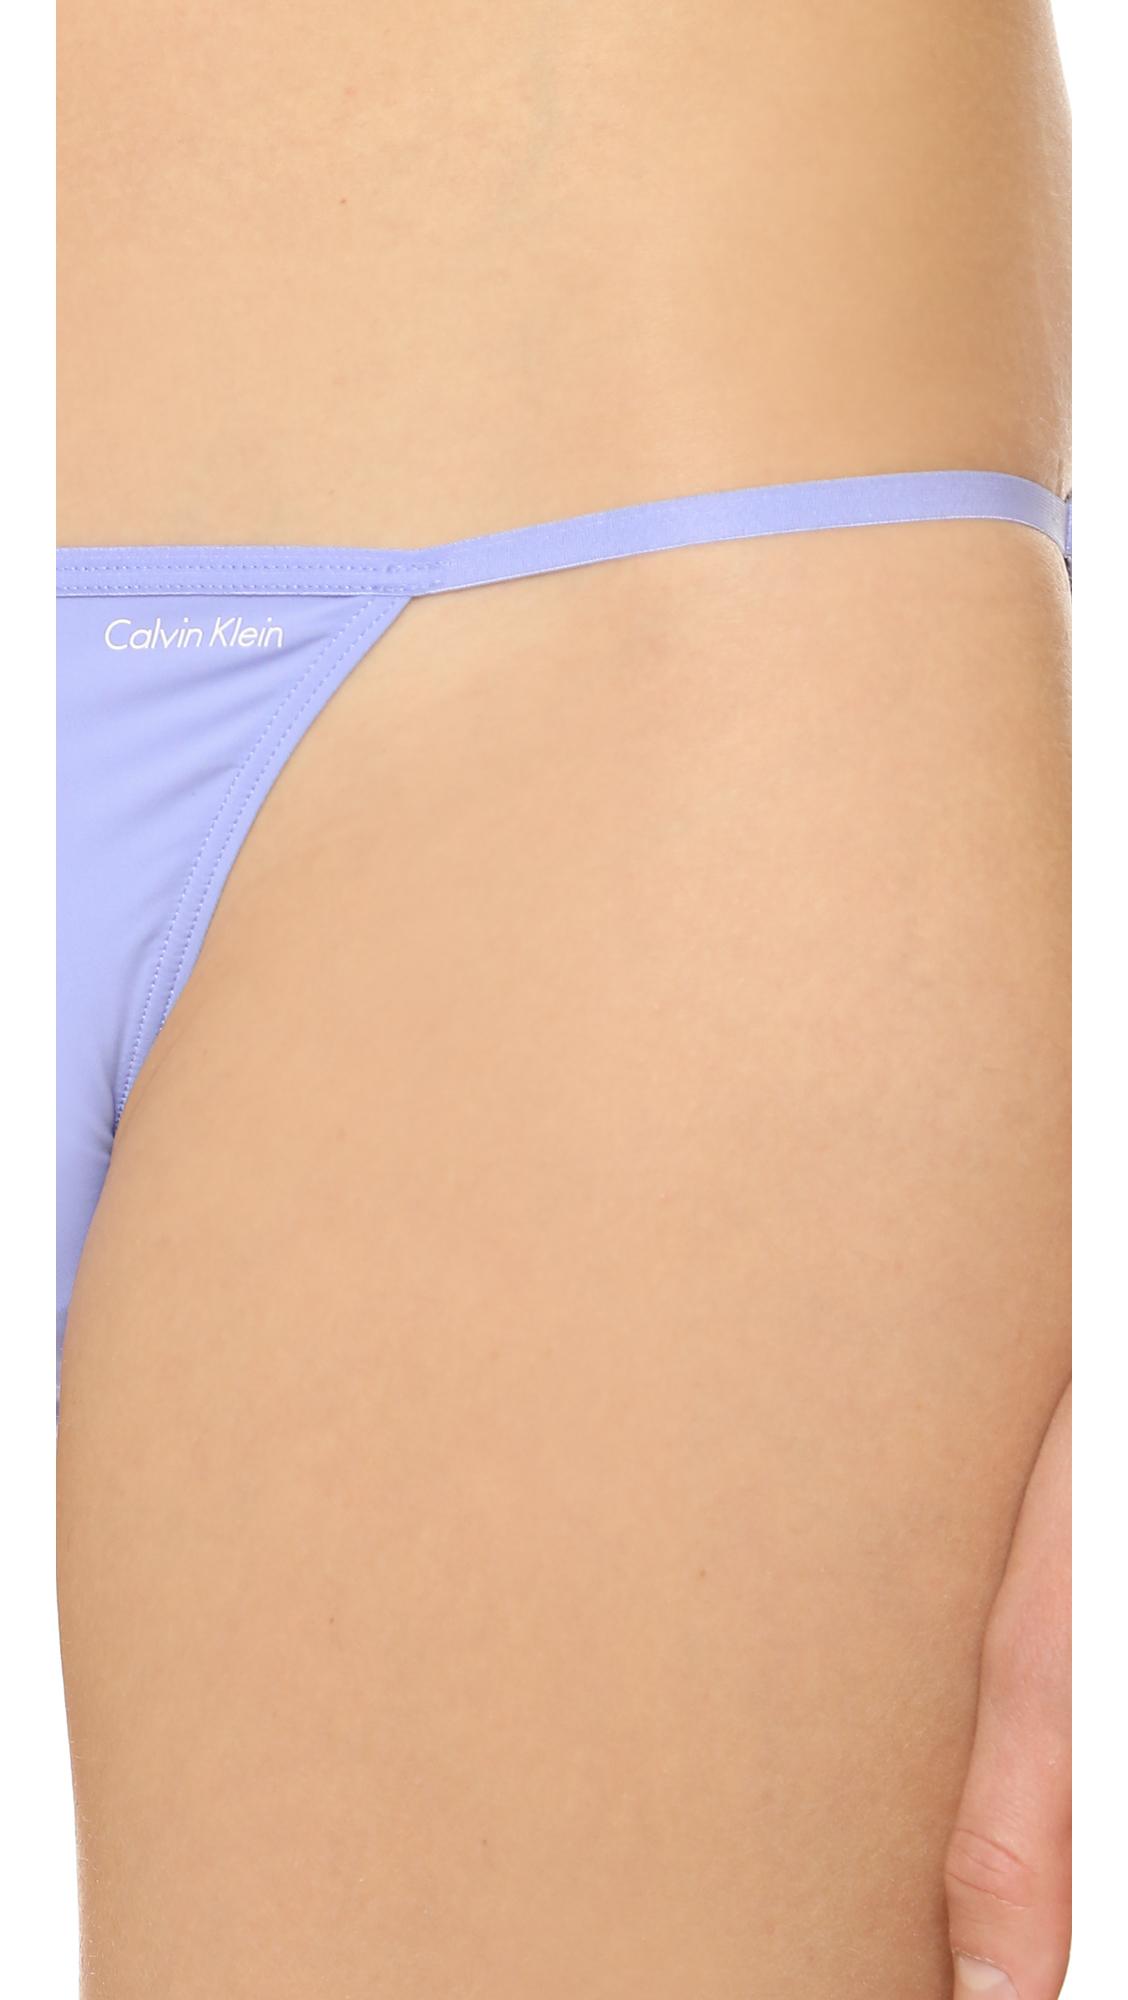 1c0f0524596 Calvin Klein Sleek String Bikini Panties - Sonoma in Purple - Lyst